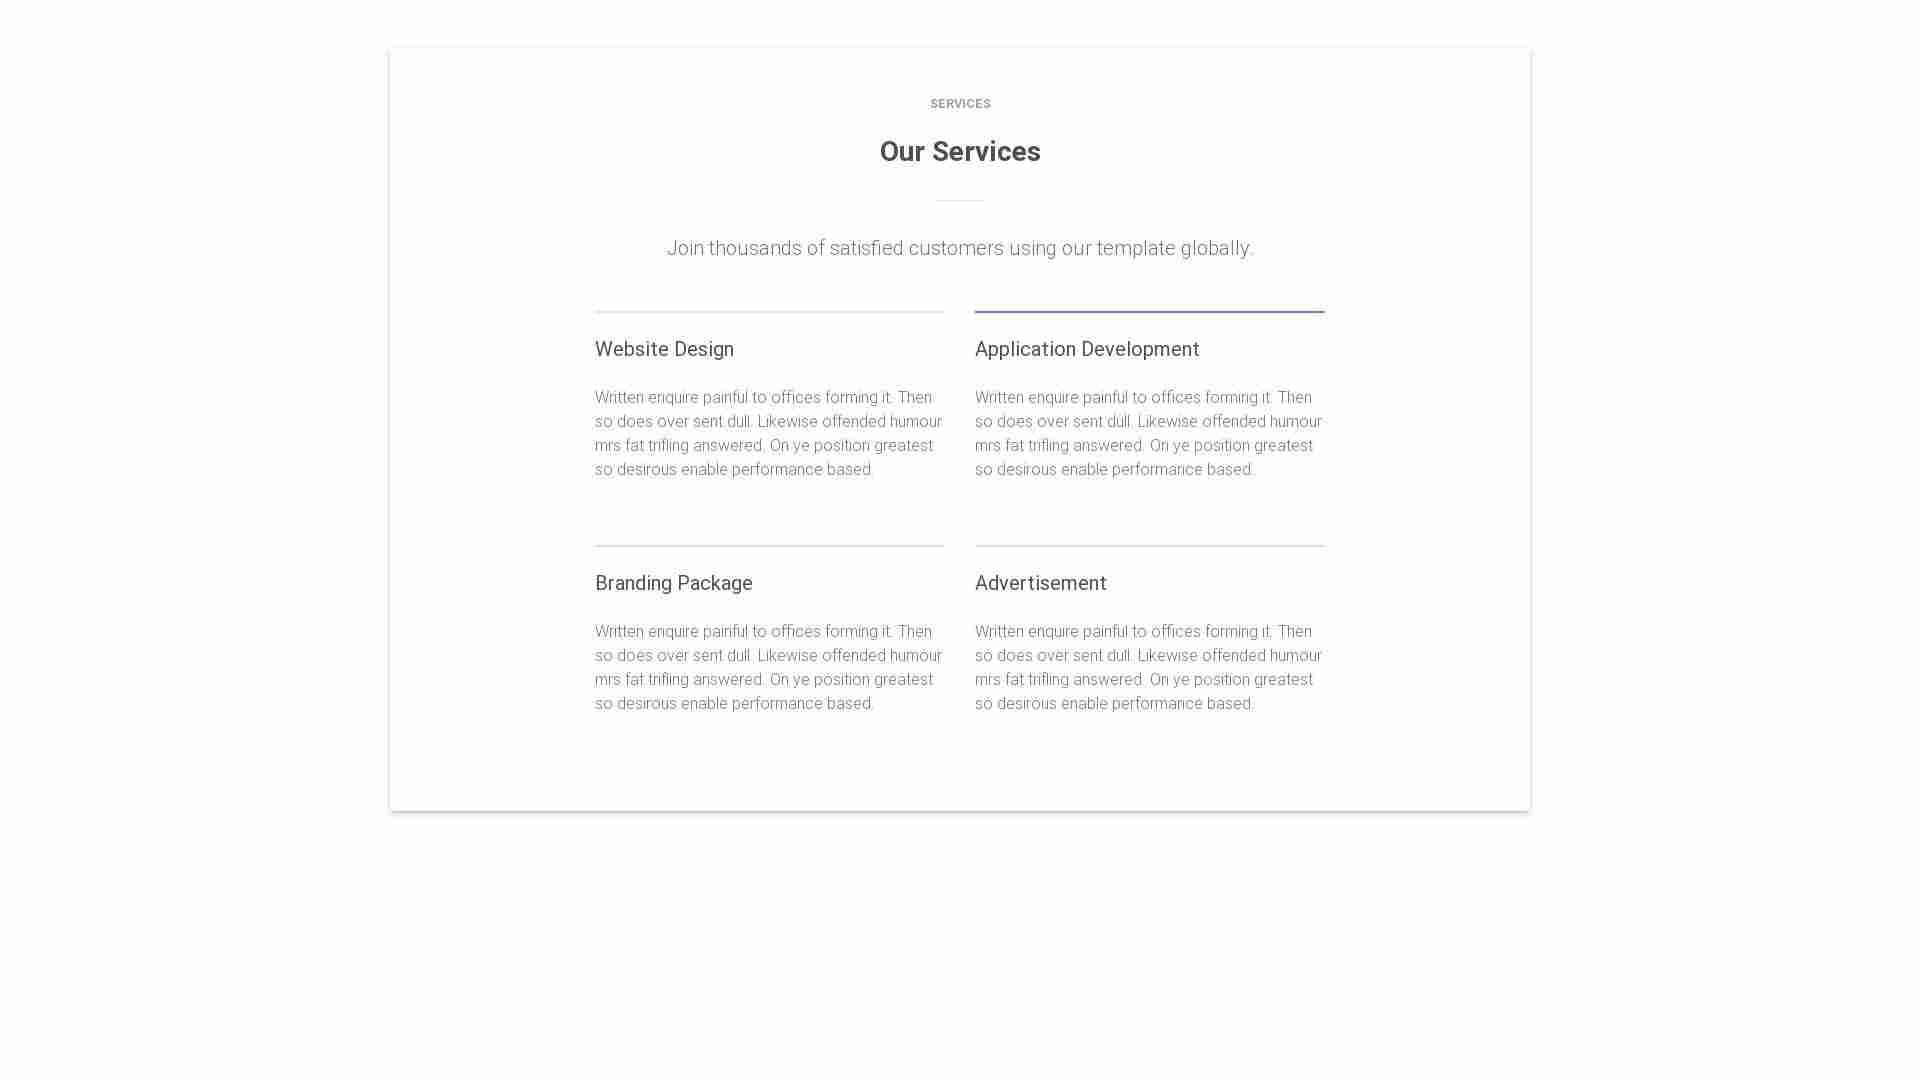 Material Design Blocks - Service 3